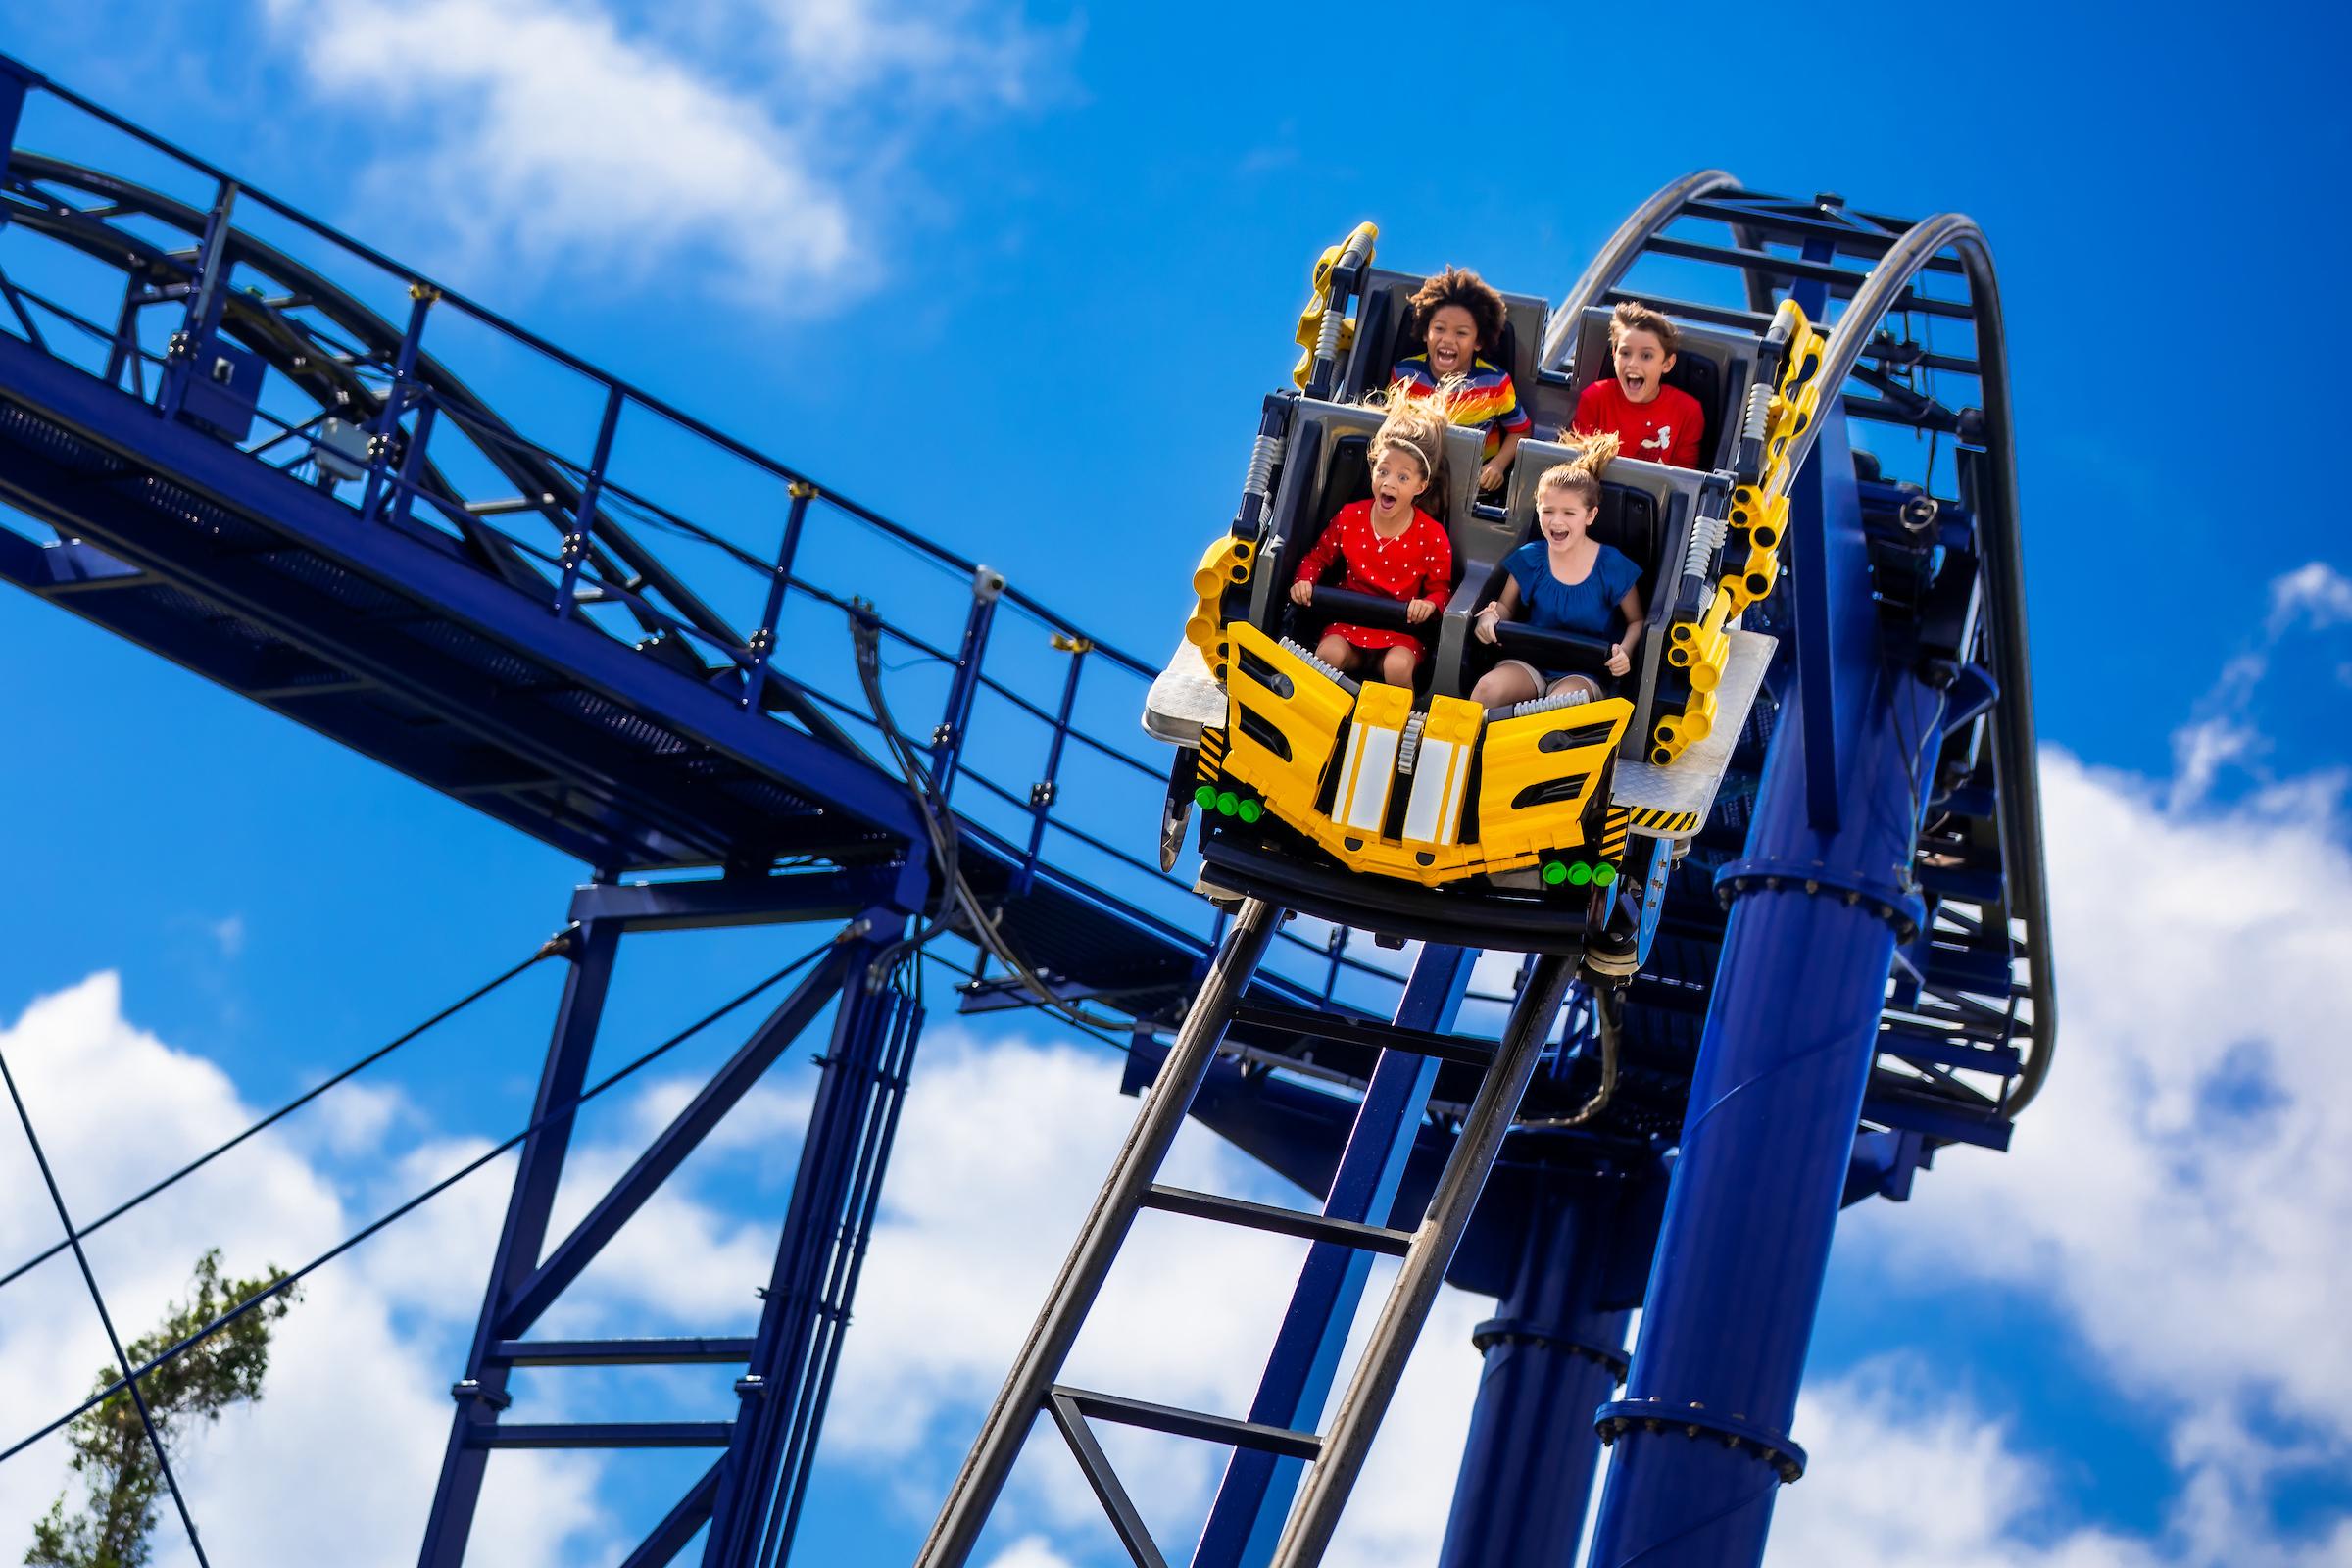 Kids on the great lego race ride at LEGOLAND florida